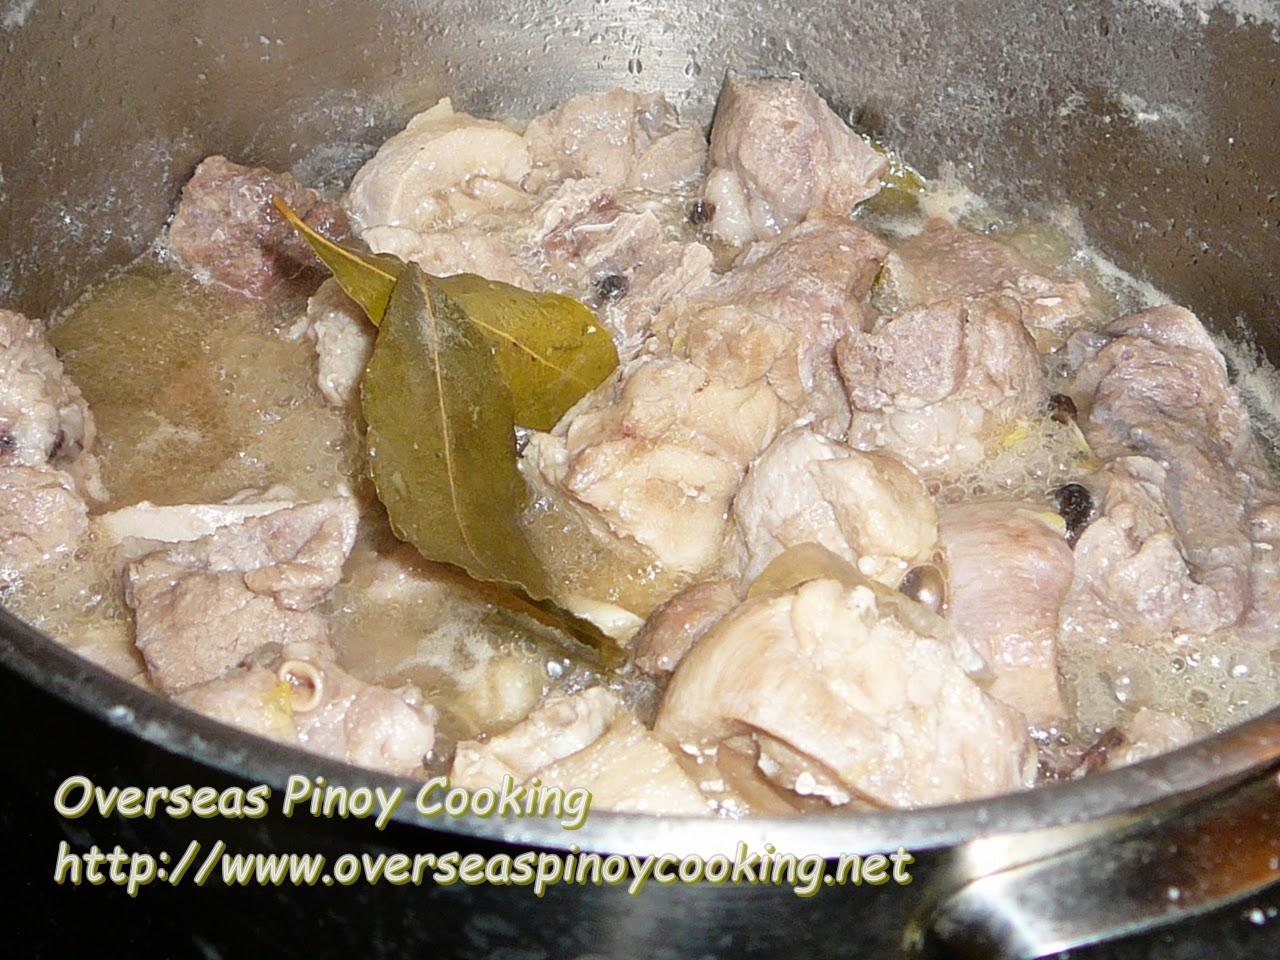 Adobong Puti, No Soy Sauce Adobo - Cooking Procedure